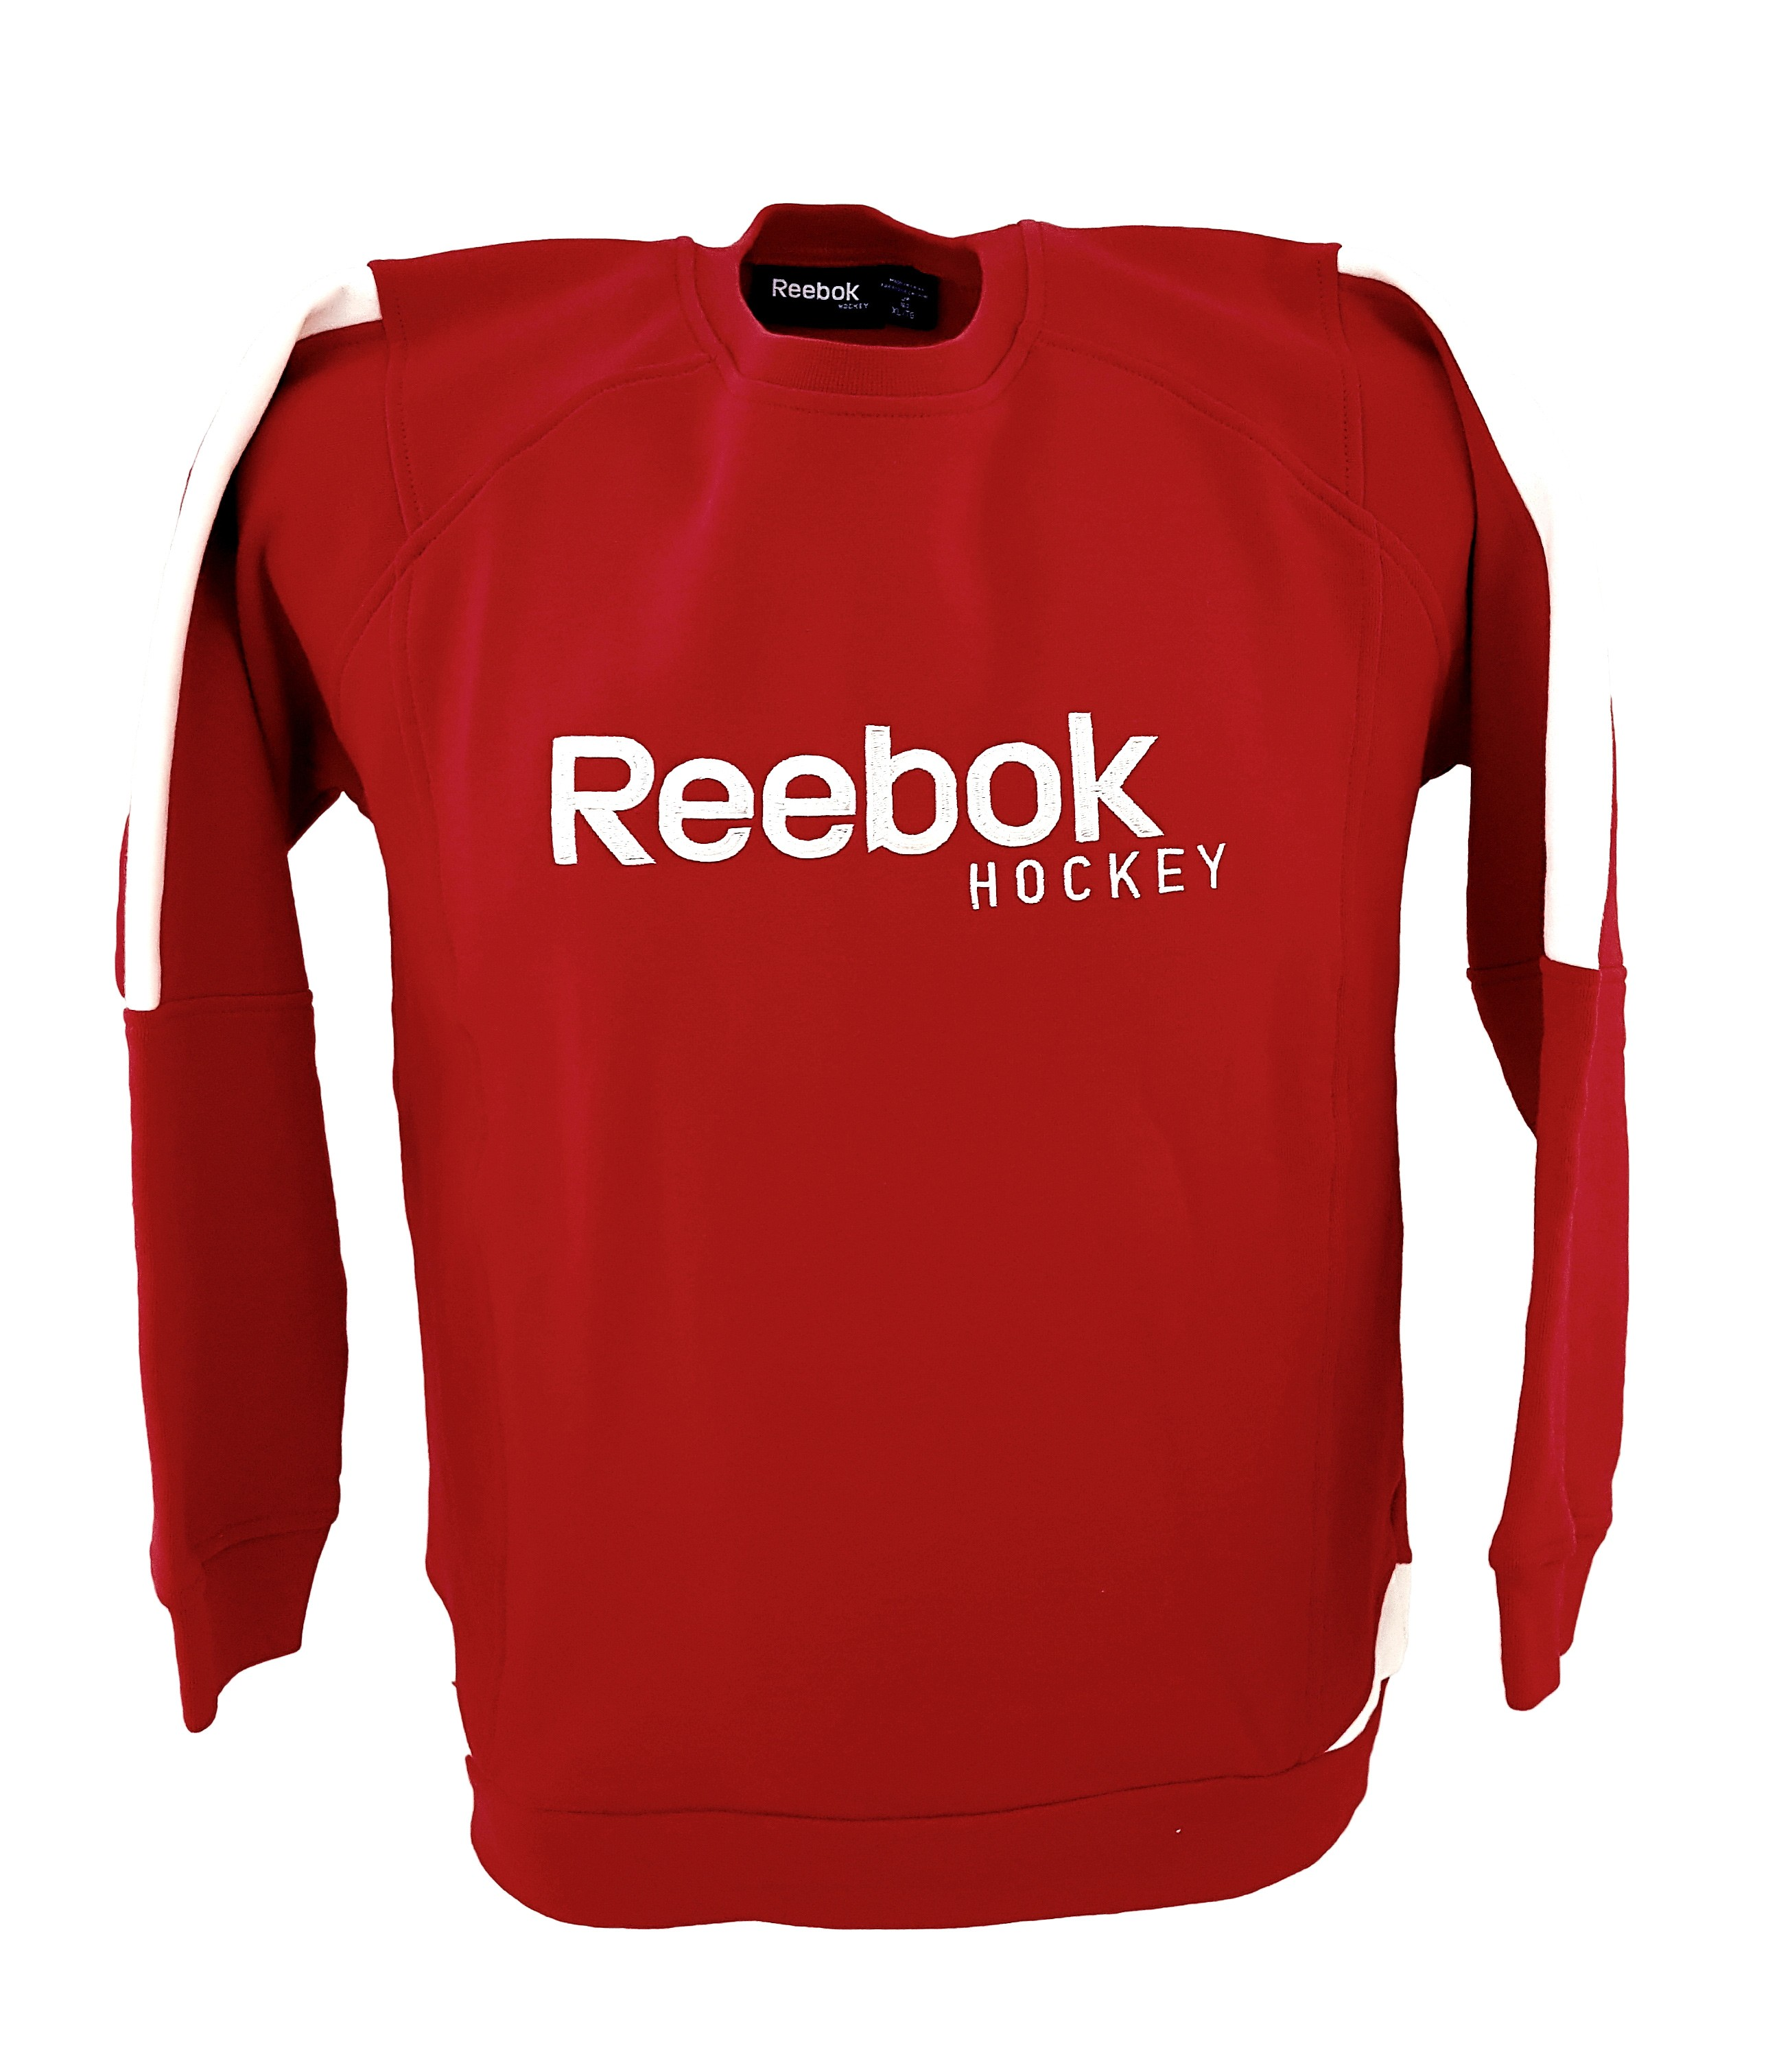 Reebok Jogging Basic Junior Tracksuit